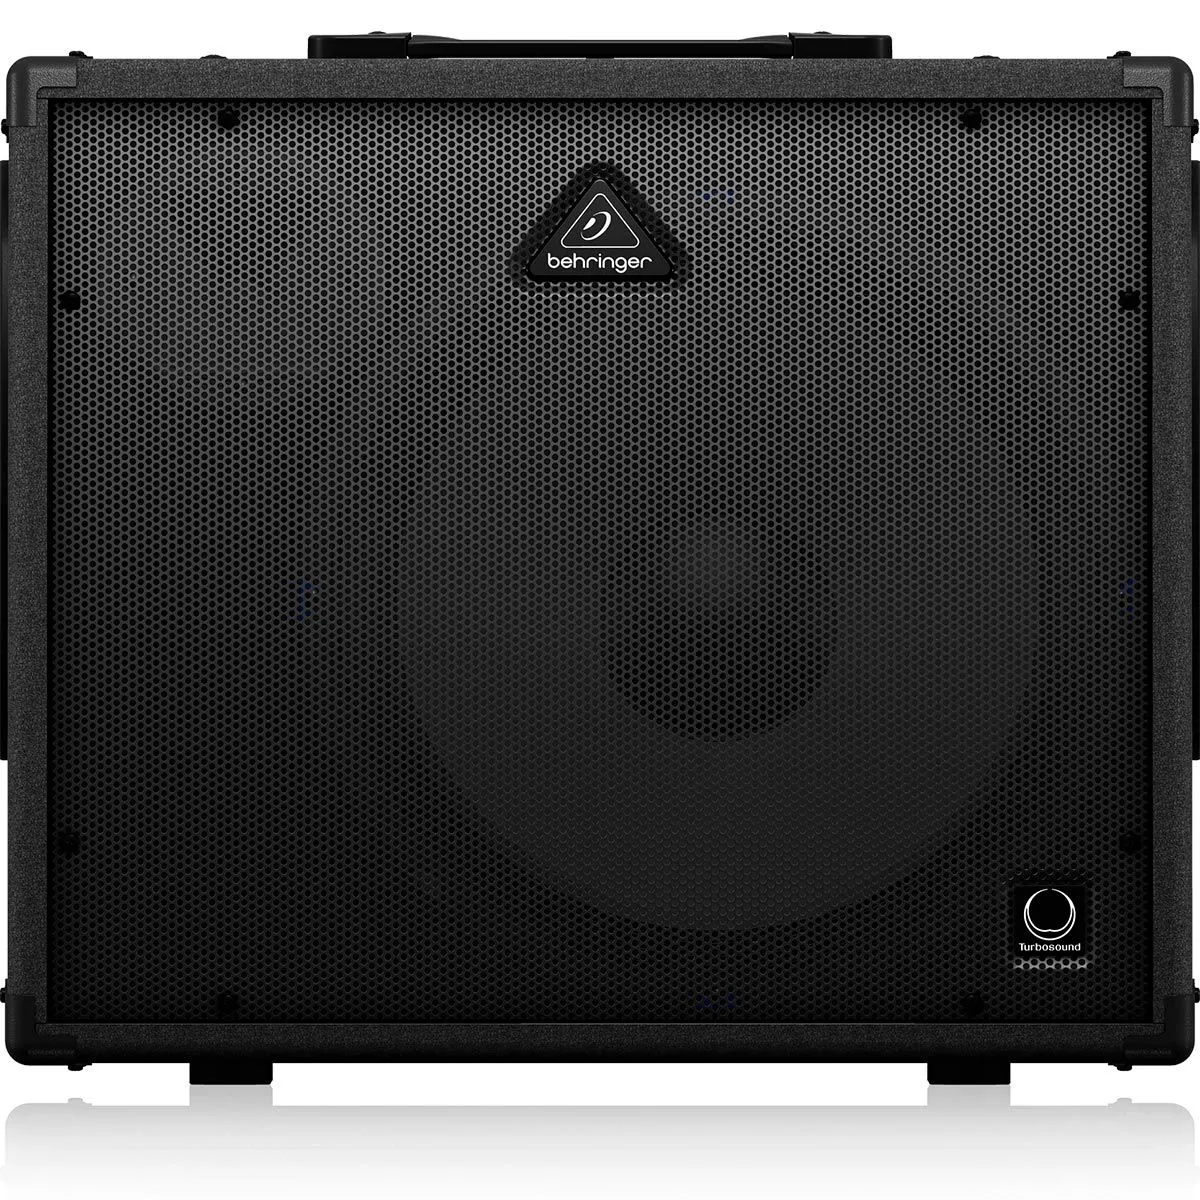 Caixa Amplificada Behringer Ultratone KXD15 600W 1x15